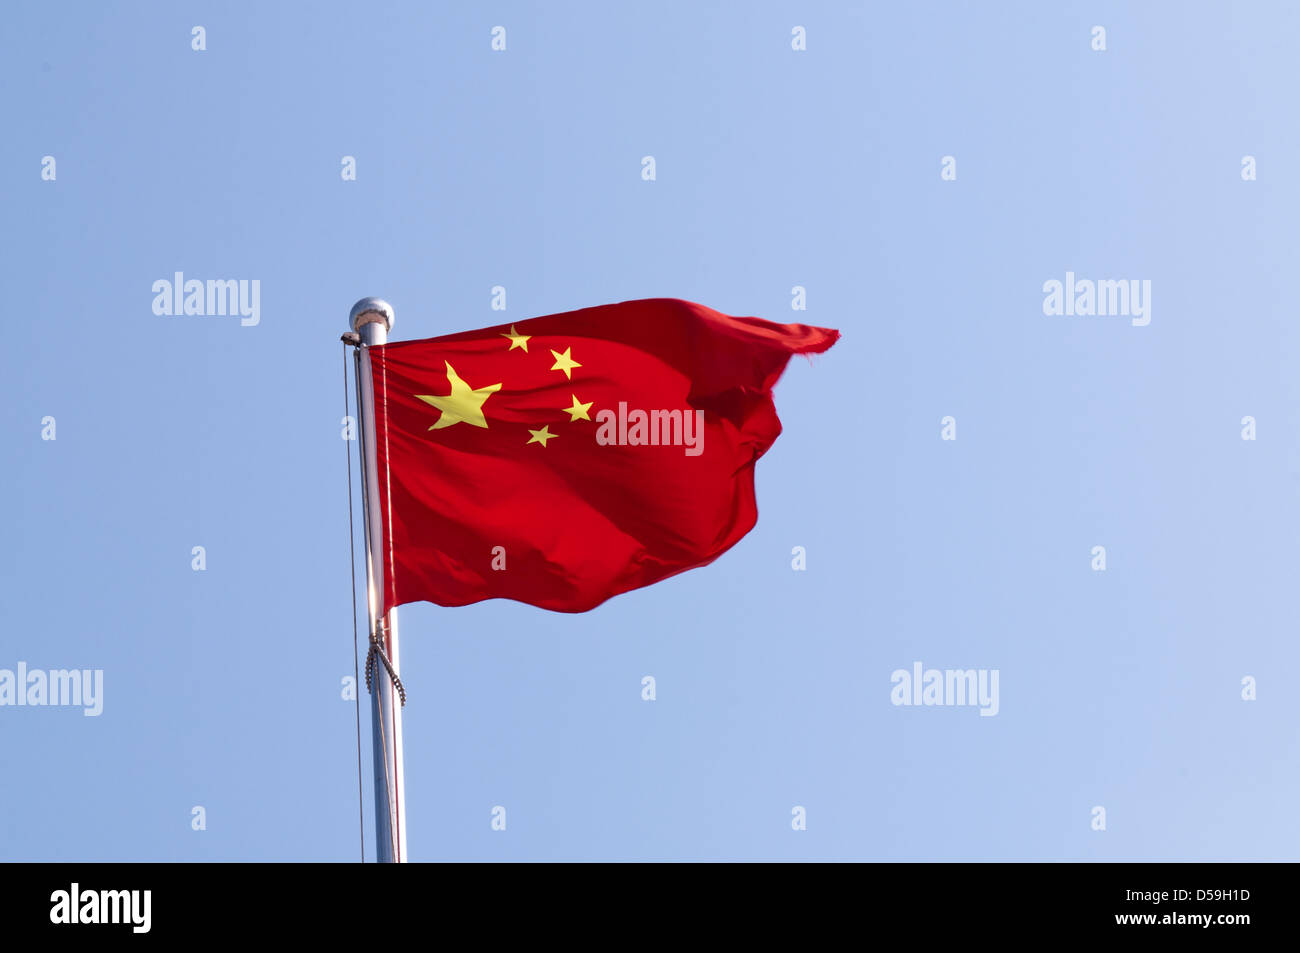 chinese flag on blue sky background - Stock Image